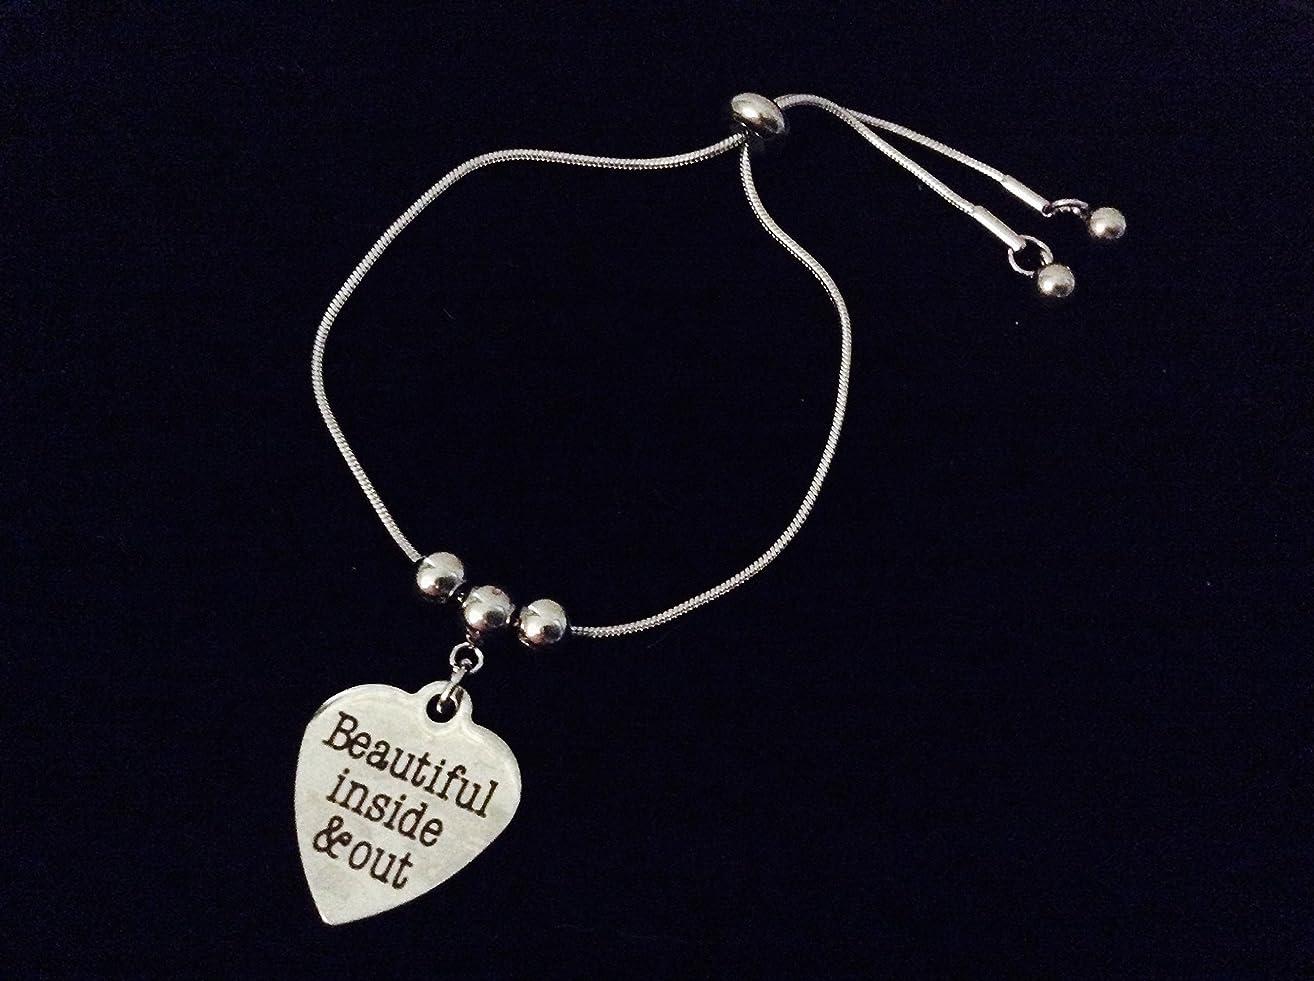 Beautiful Inside and Out Adjustable Bolo Bracelet Stainless Steel Adjustable Bracelet Slider Charm Bracelet Gift One Size Fits All